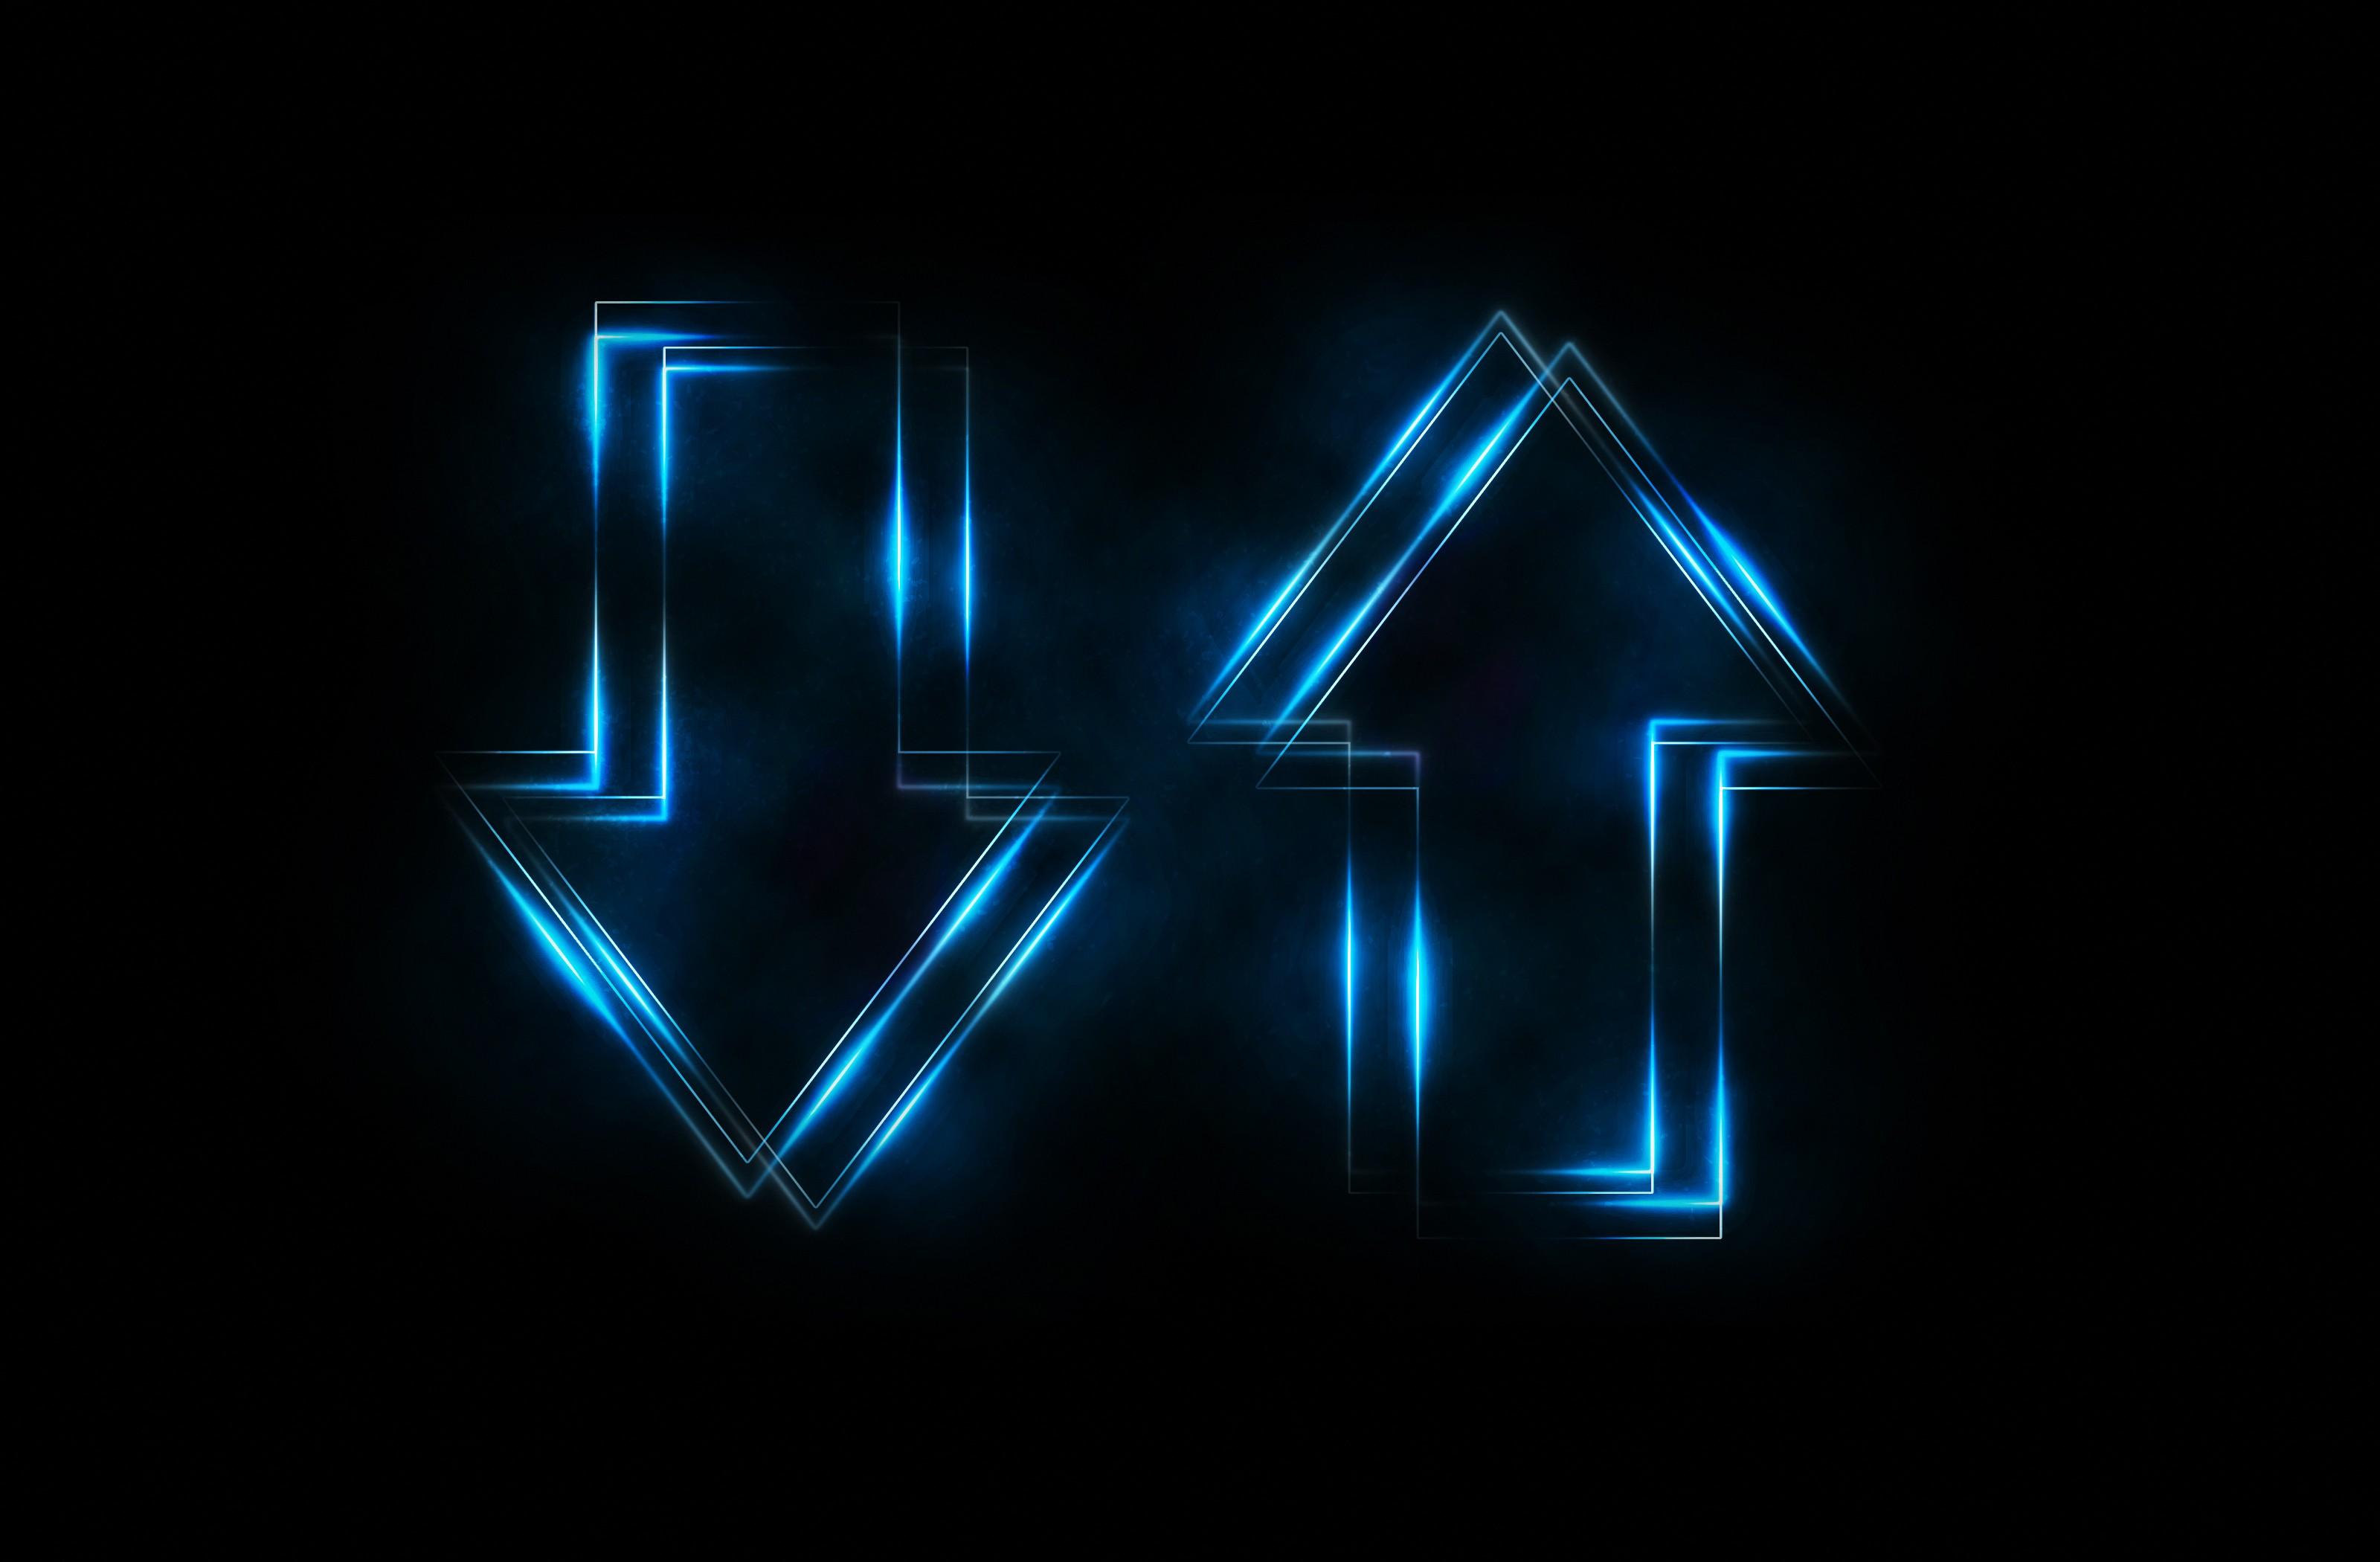 Wallpaper illustration text logo blue triangle neon sign illustration neon text logo blue triangle neon sign arrows artwork light shape line darkness number screenshot altavistaventures Image collections